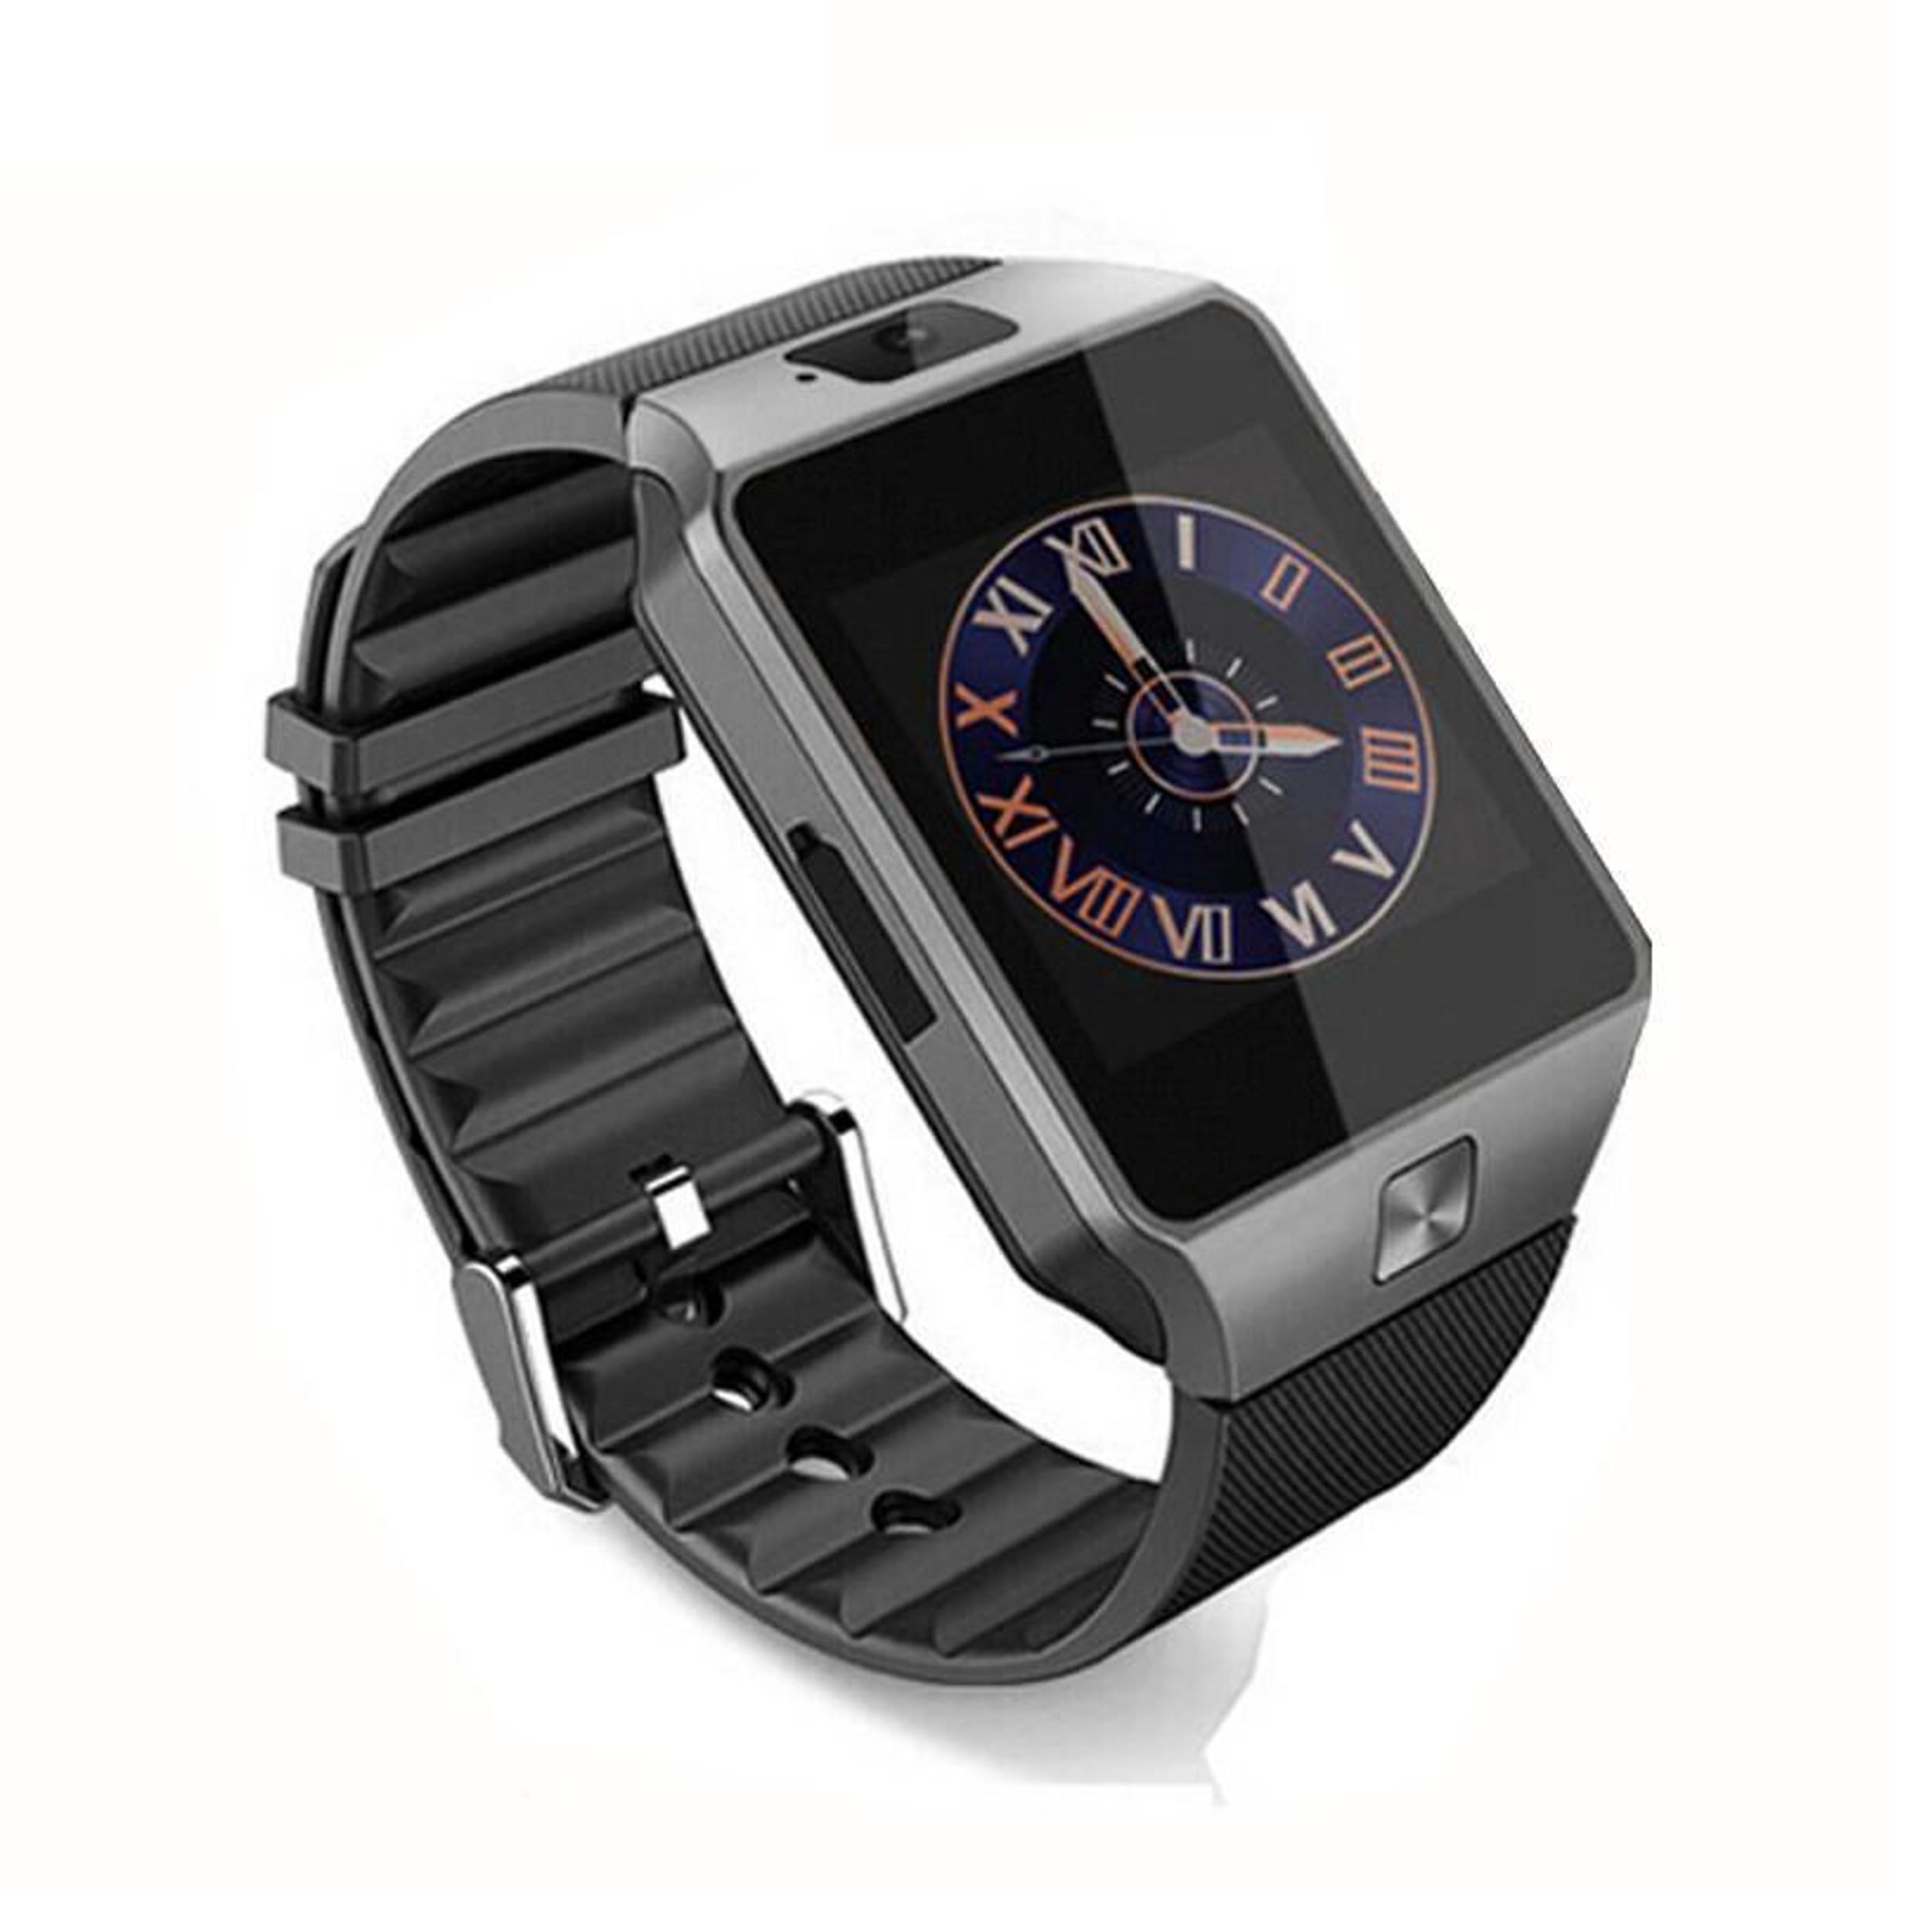 MENU 2017 smartwatch HIT SAMSUNG GALAXY NOTE 3